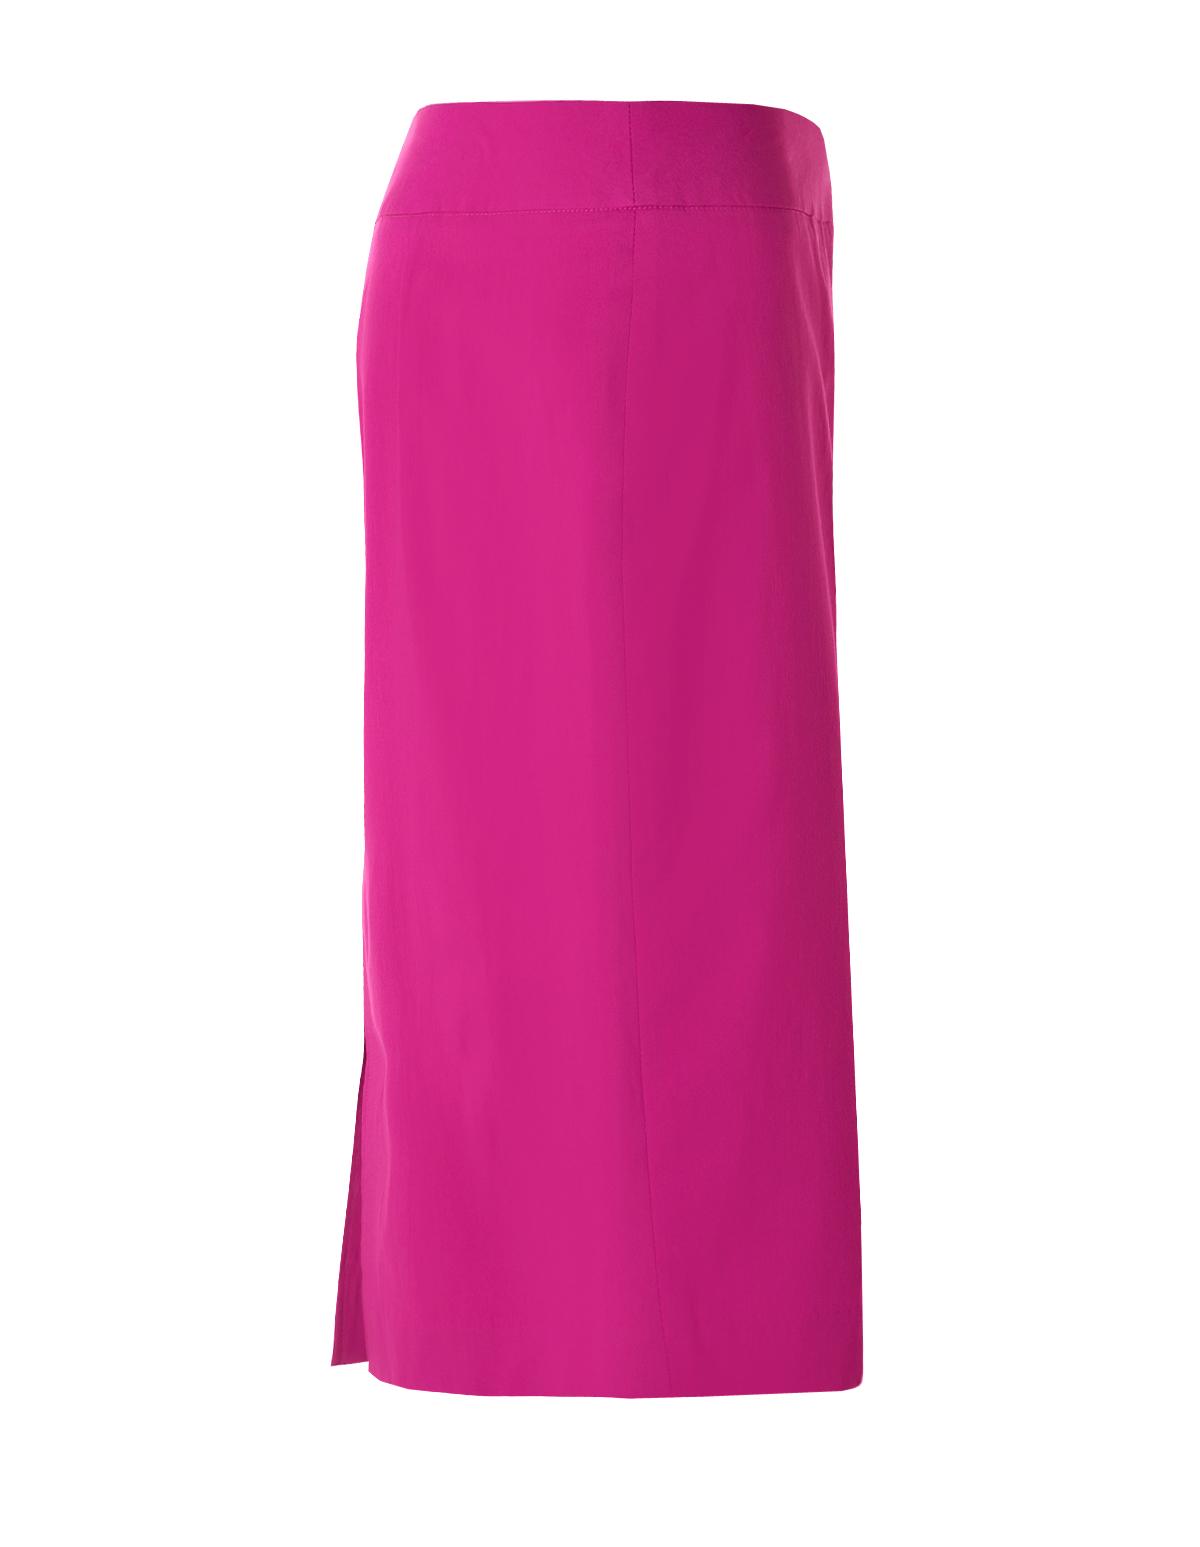 Pink Pencil Skirt 97